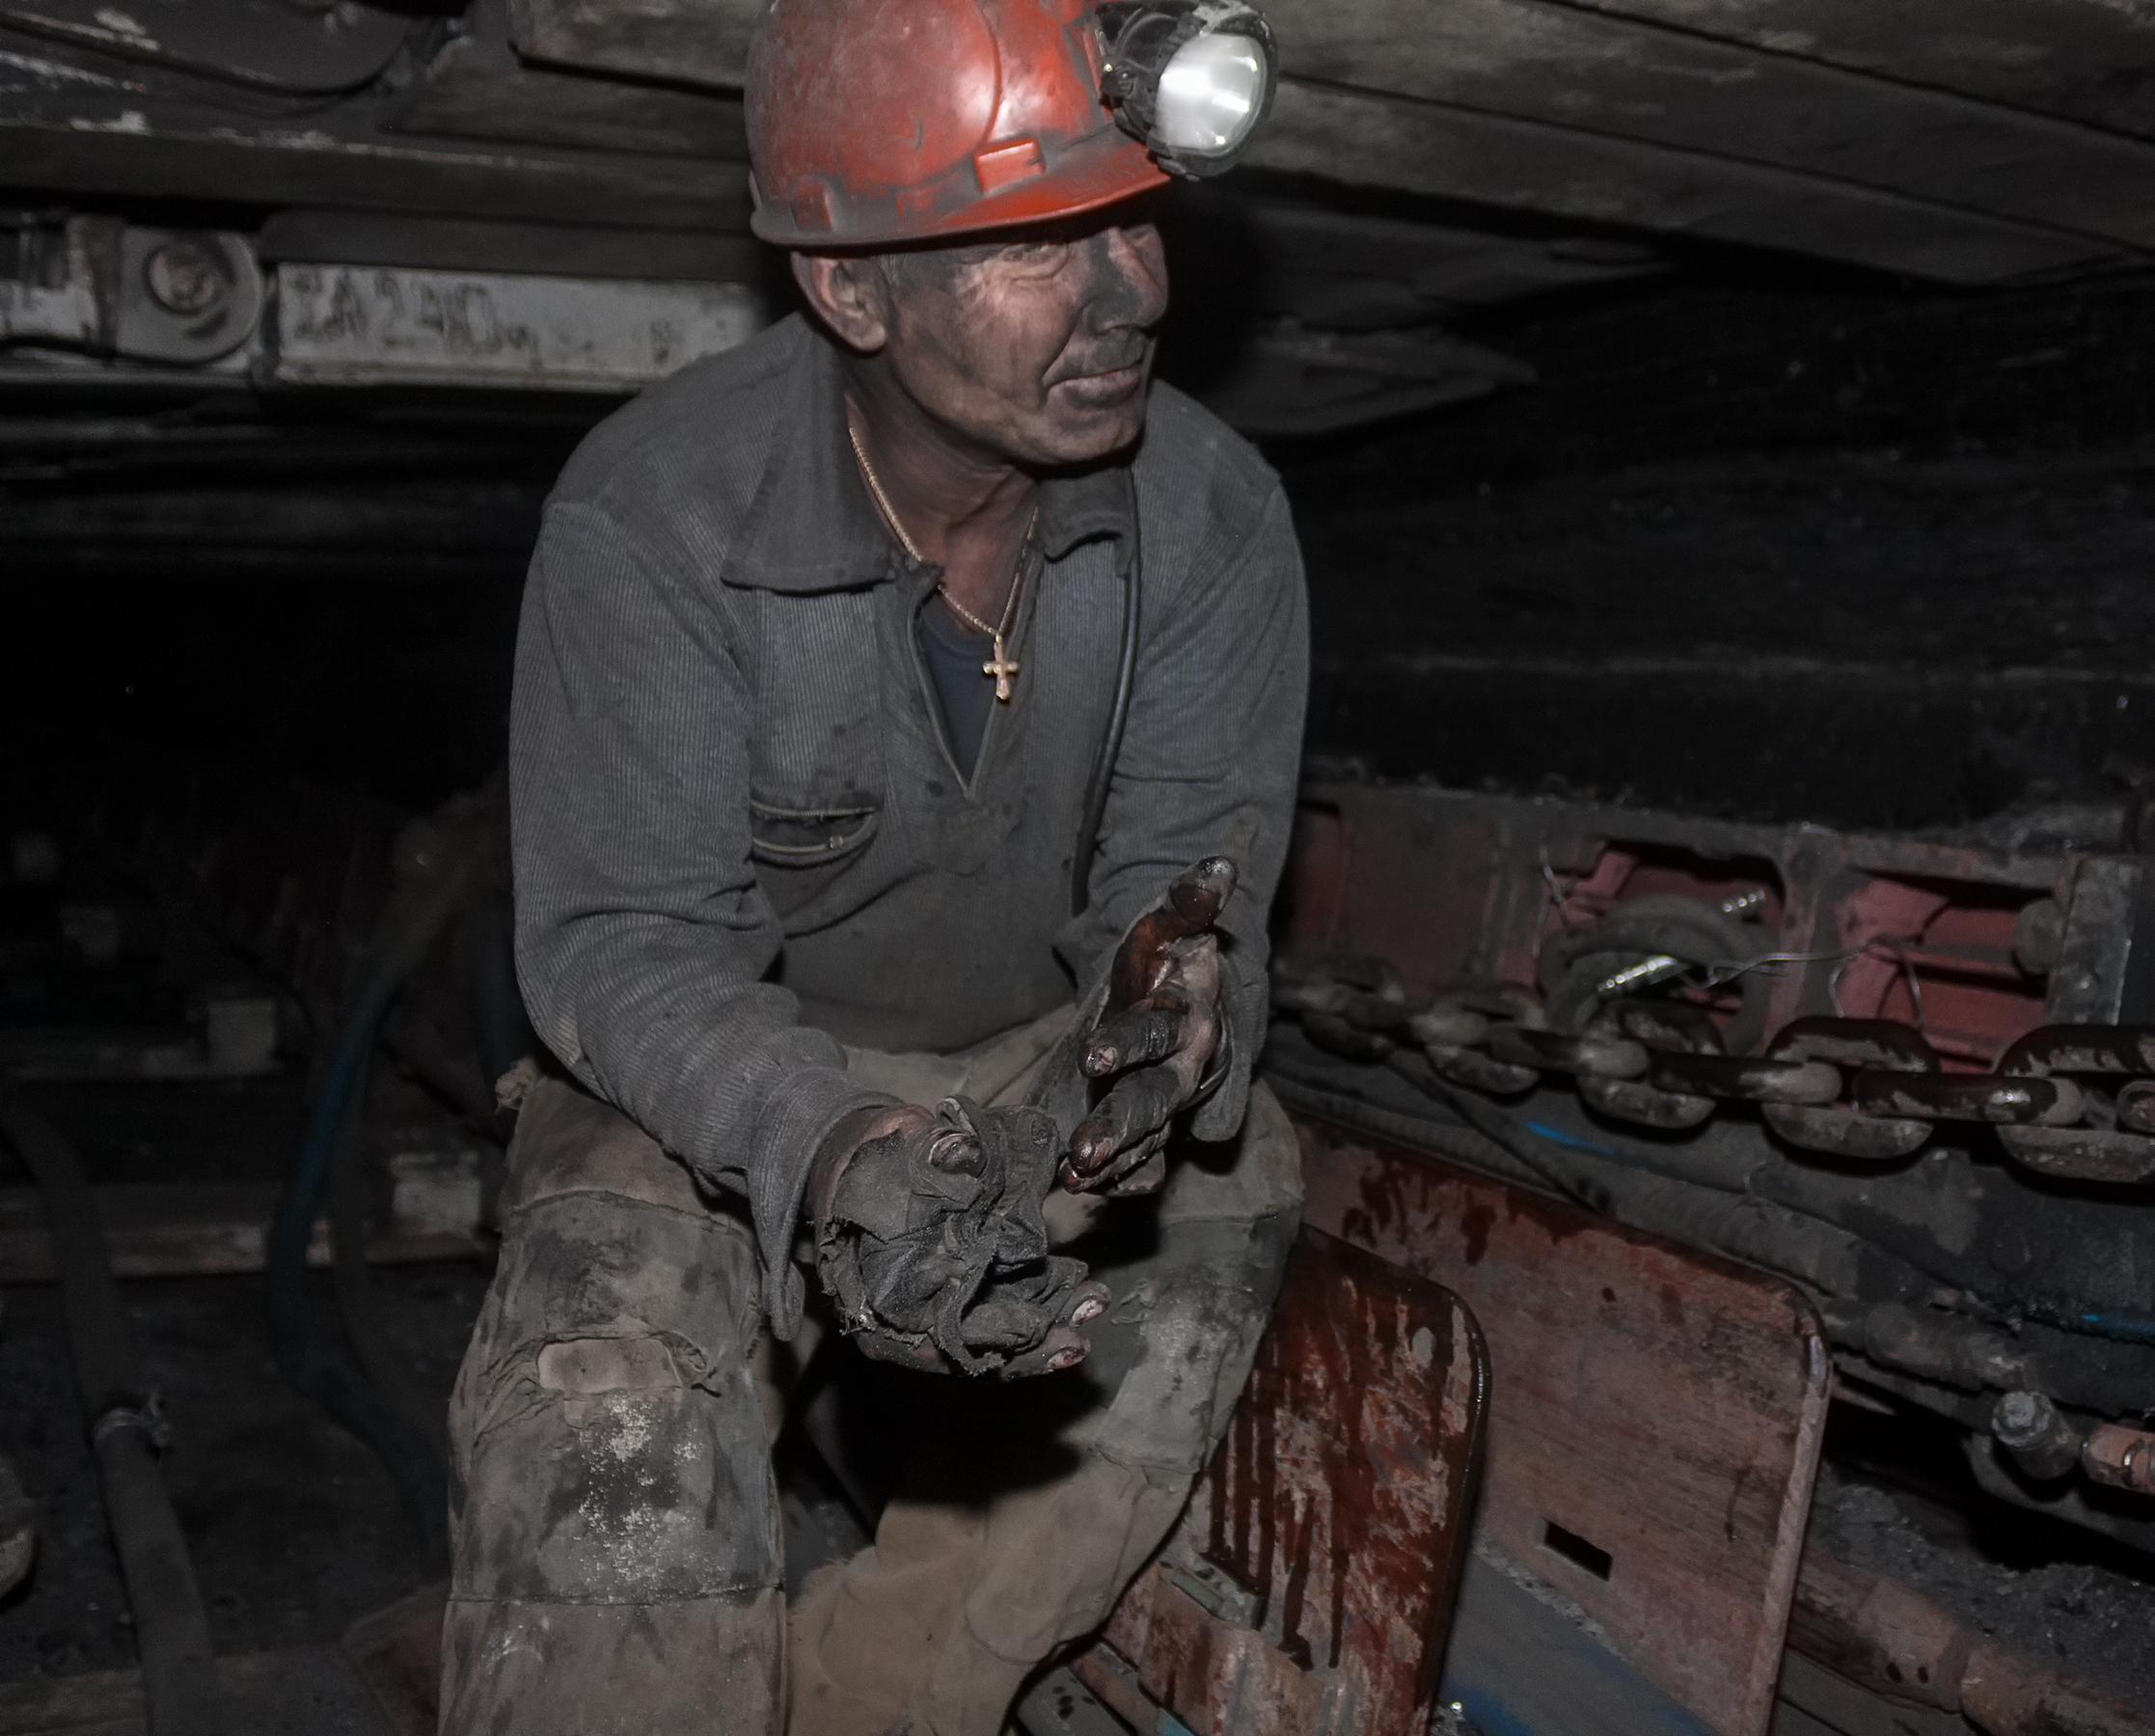 A coal miner working in a mine